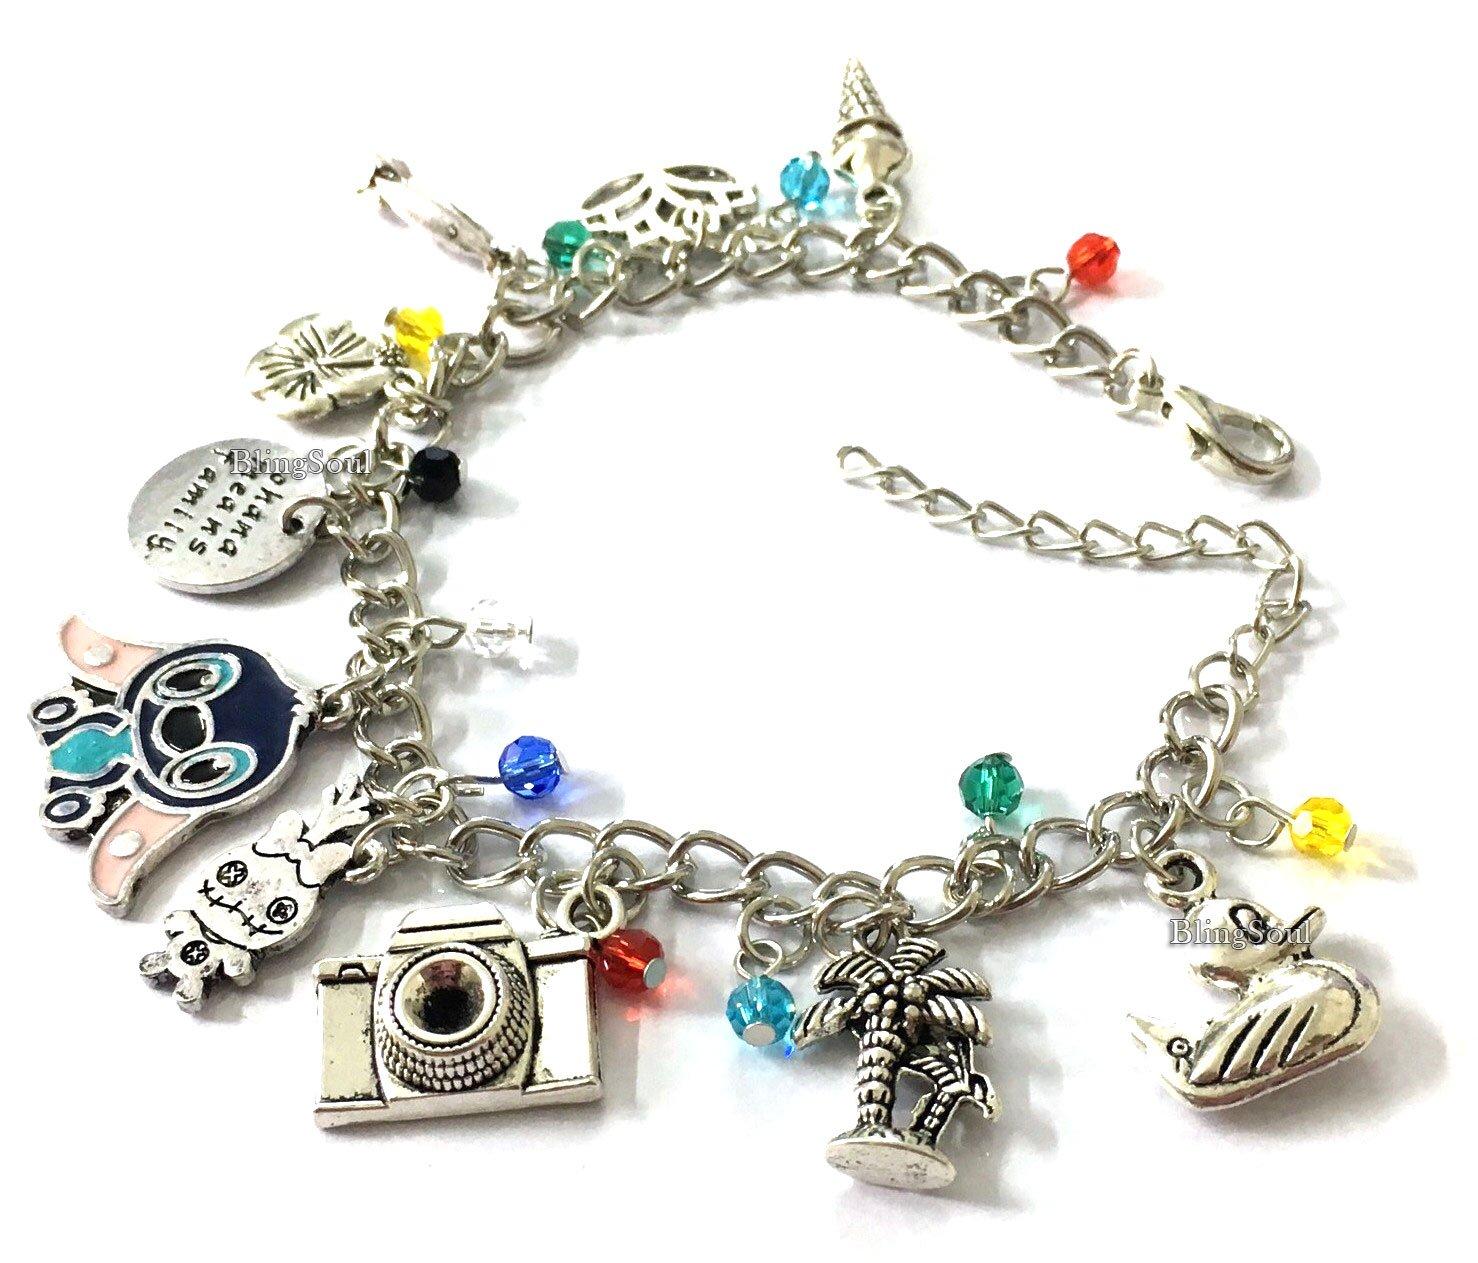 BlingSoul Lilo Stitch Jewelry Merchandise Gifts - Lilo Bracelets Disney Jewelry for Womens…